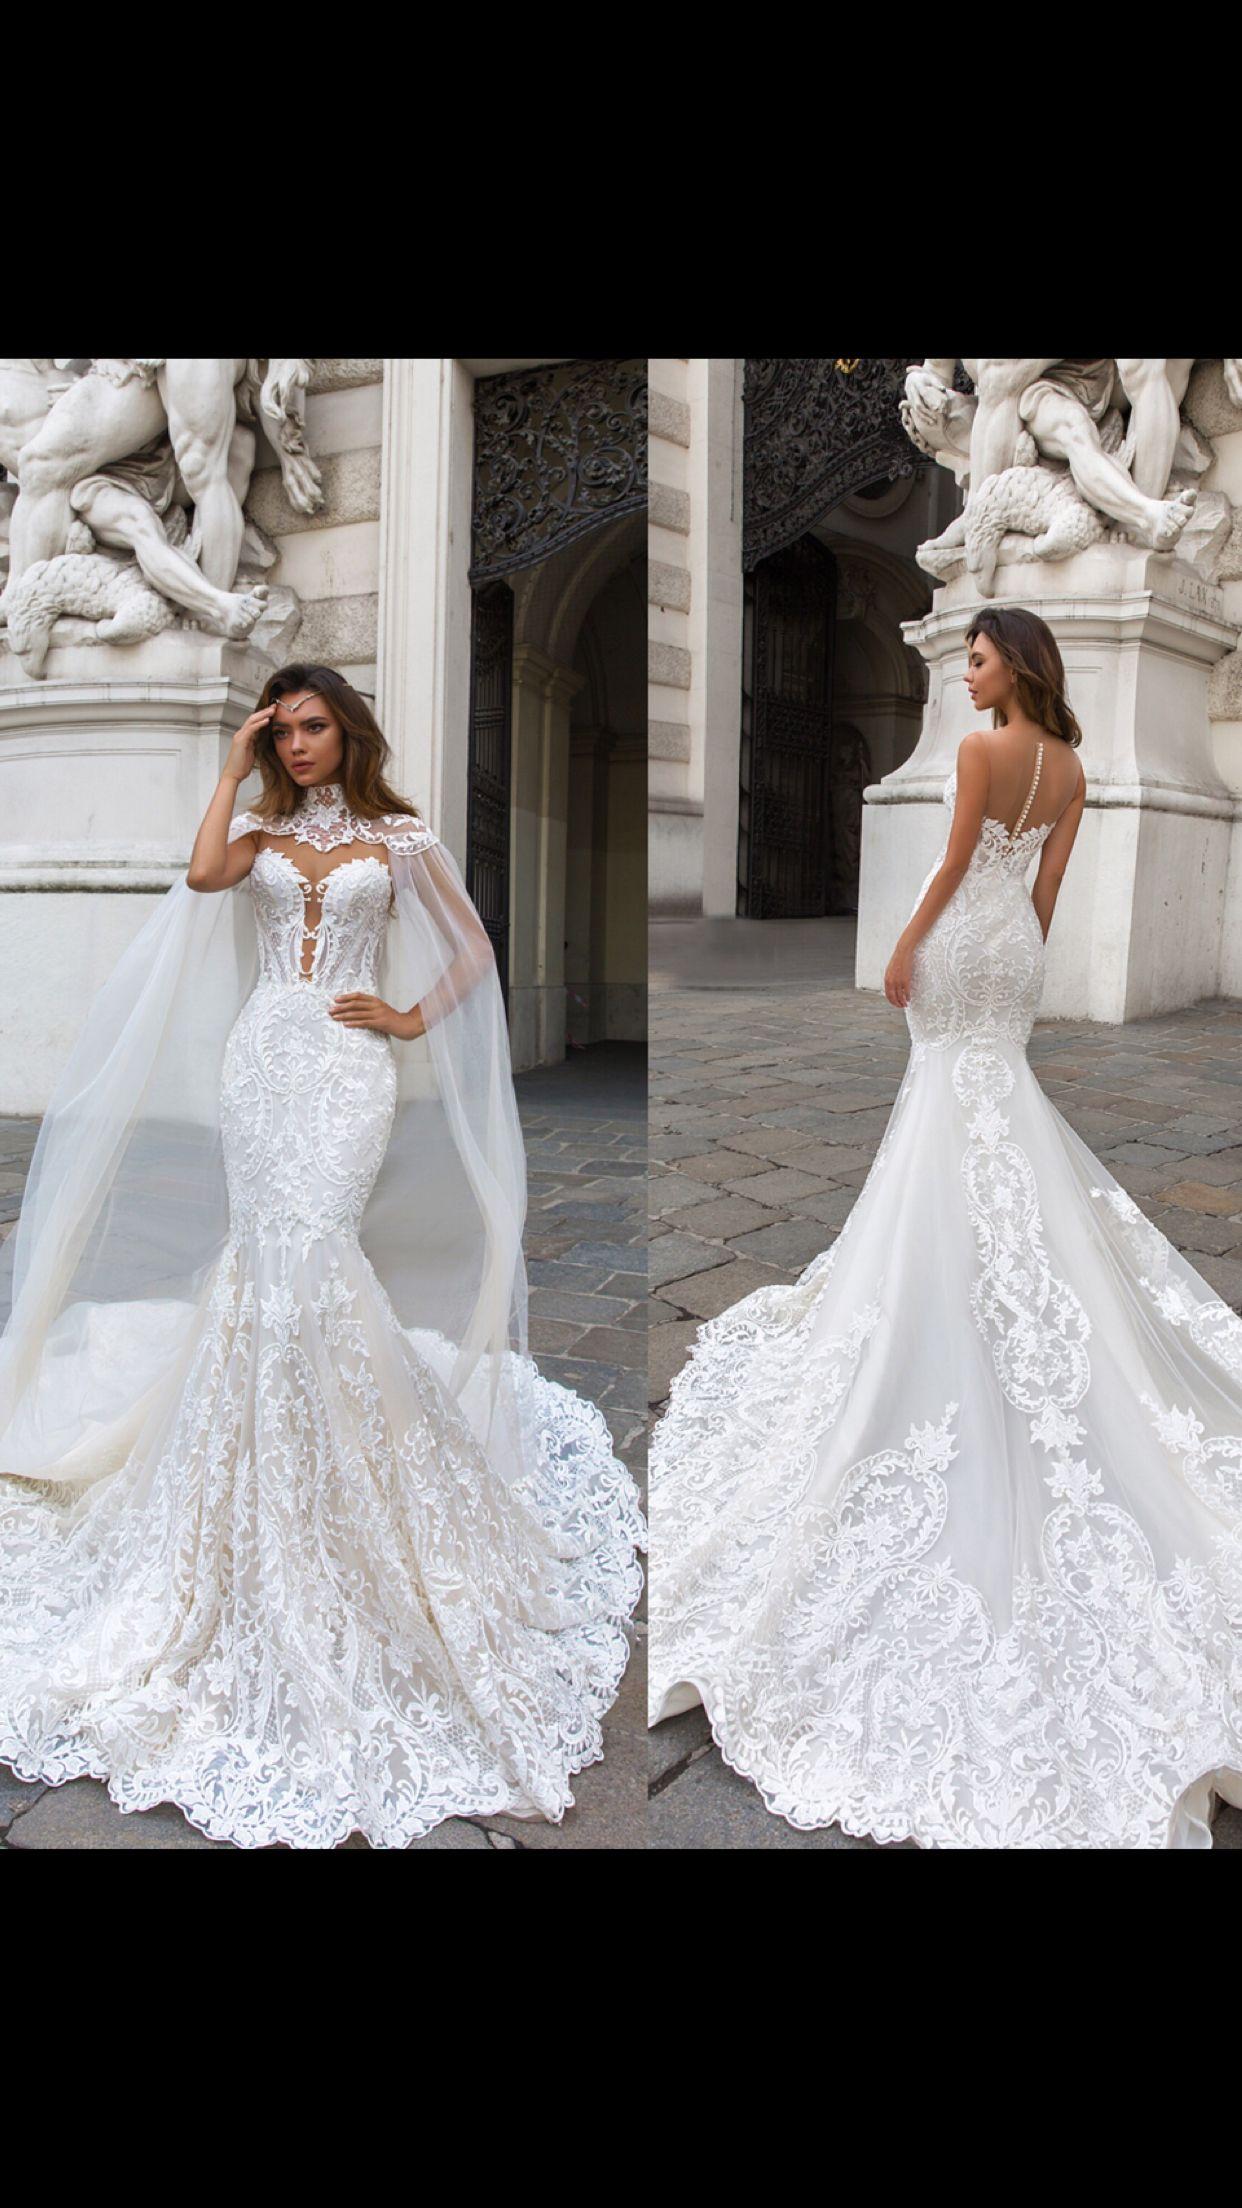 This Is My Wedding Dress Wedding Dresses Destination Dress Wedding Dresses Lace